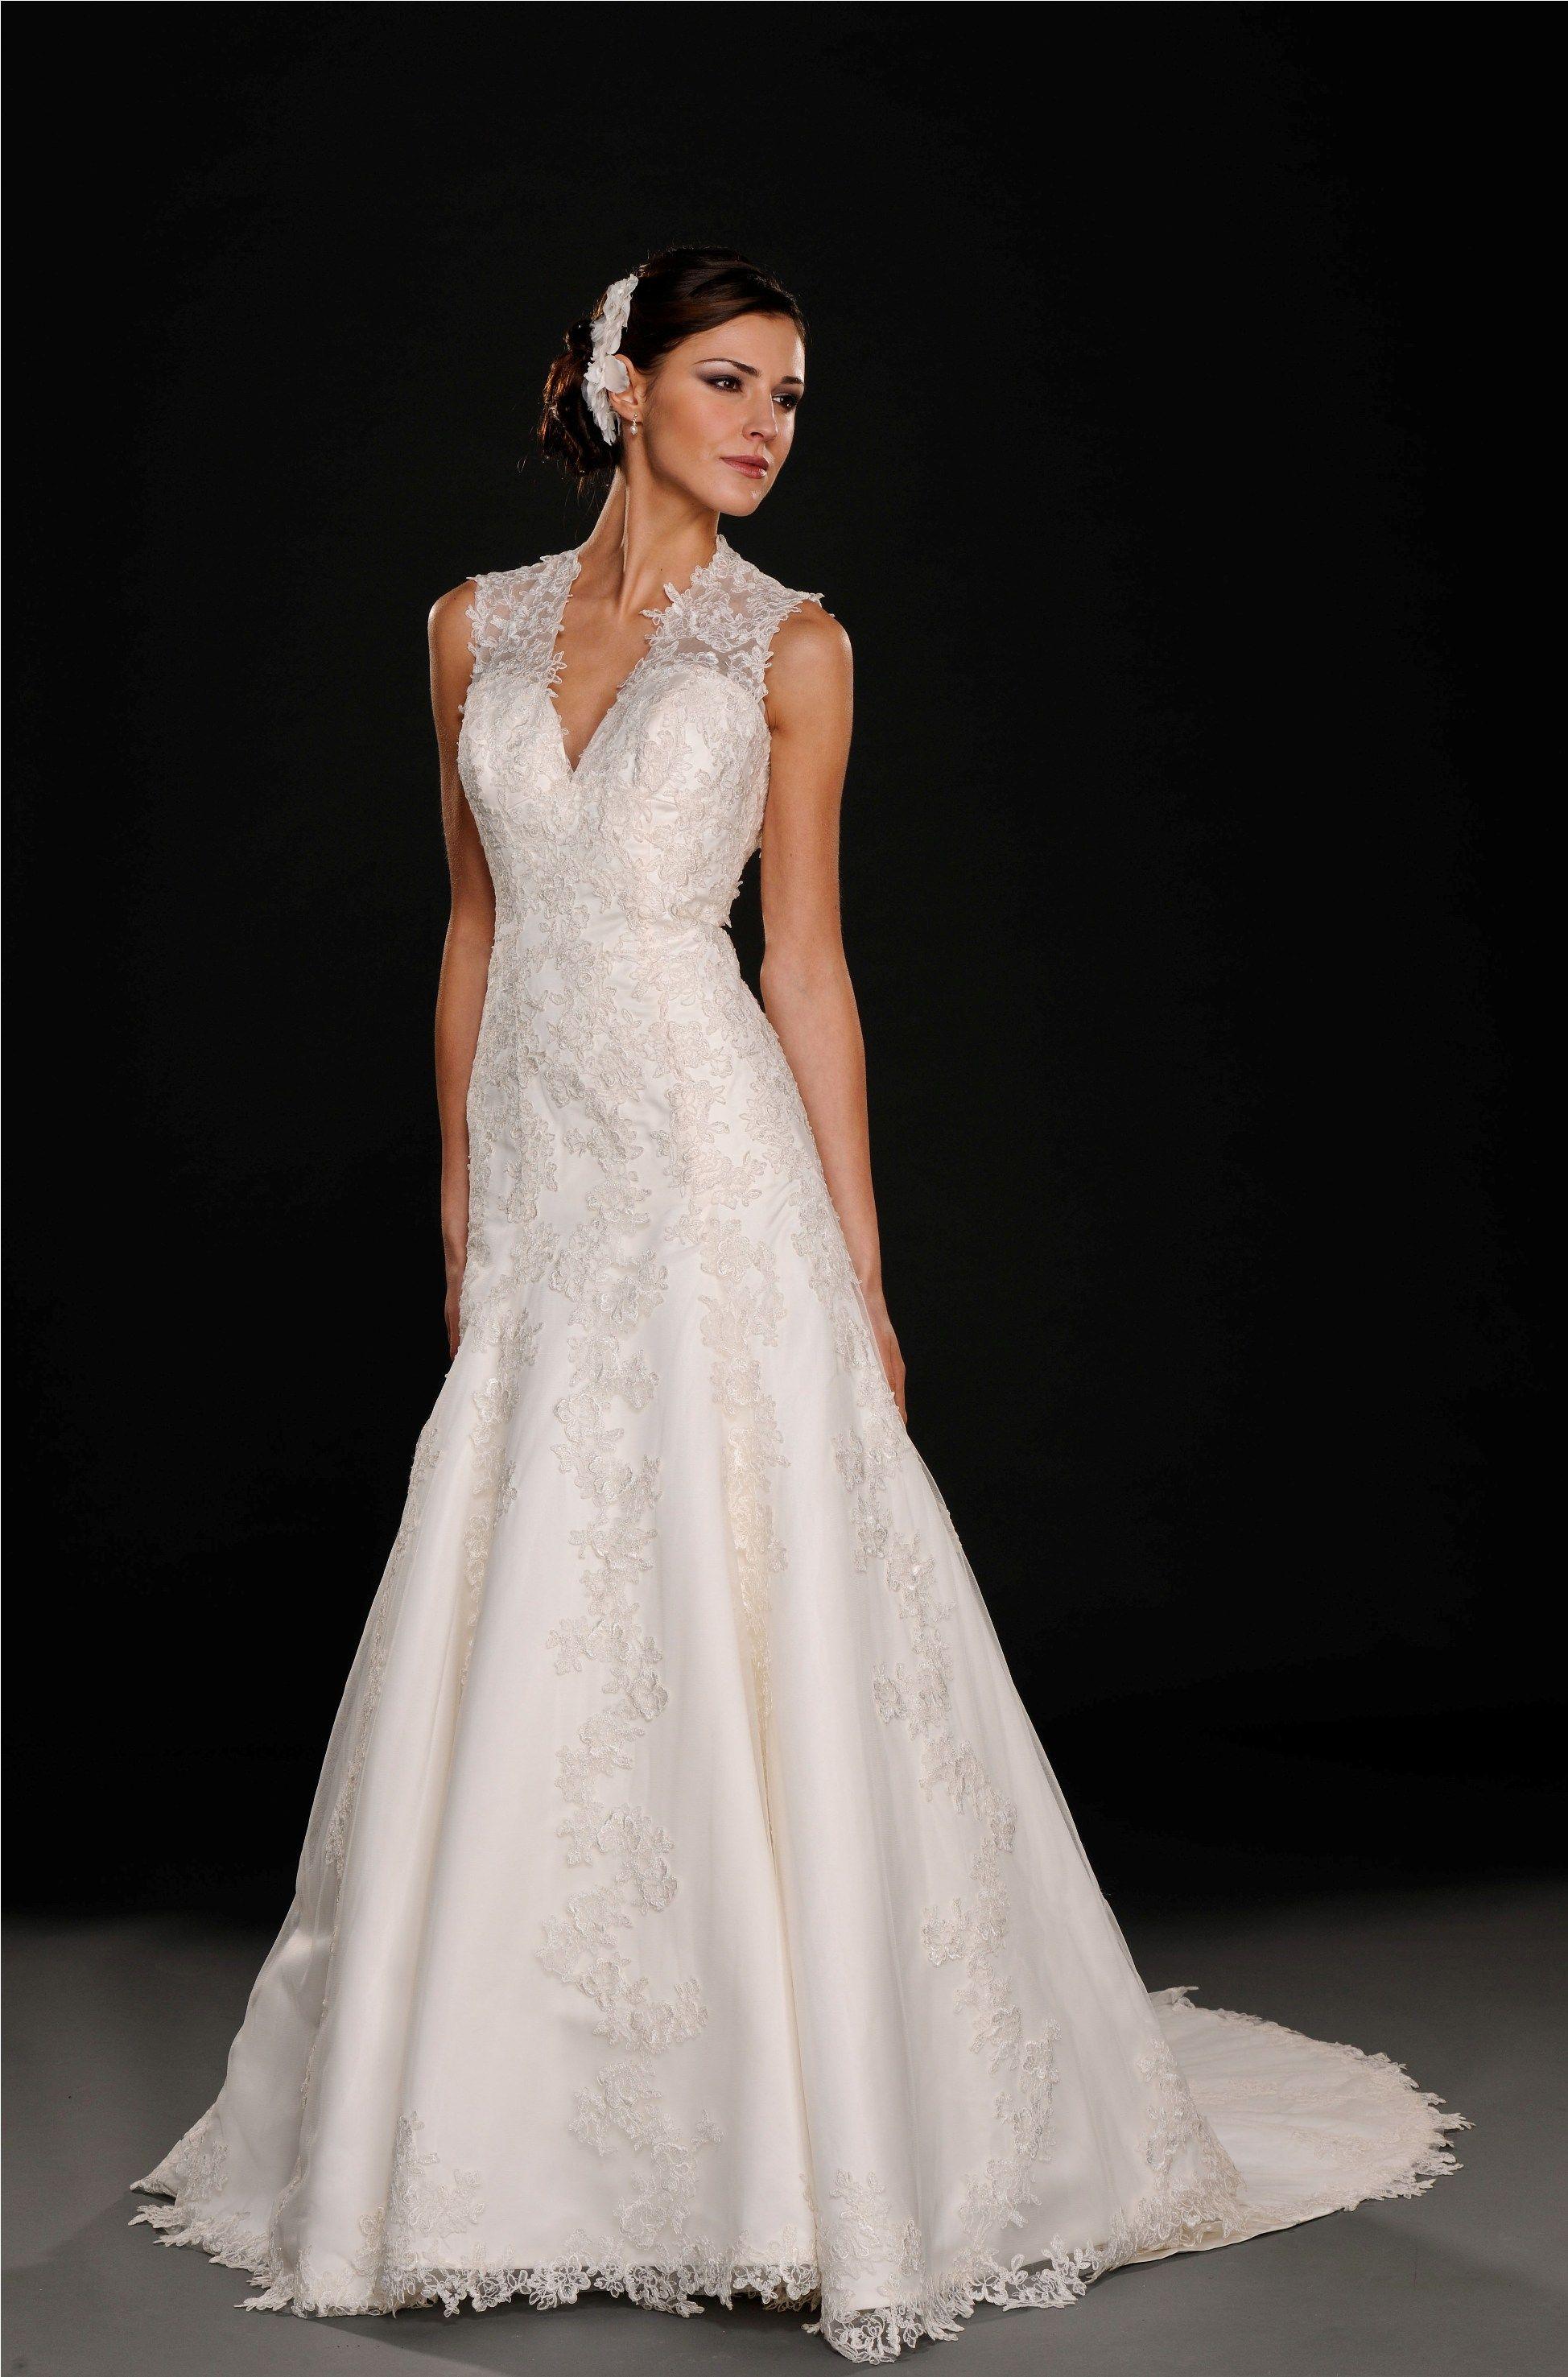 Young Bride Dresses | Wedding Gallery